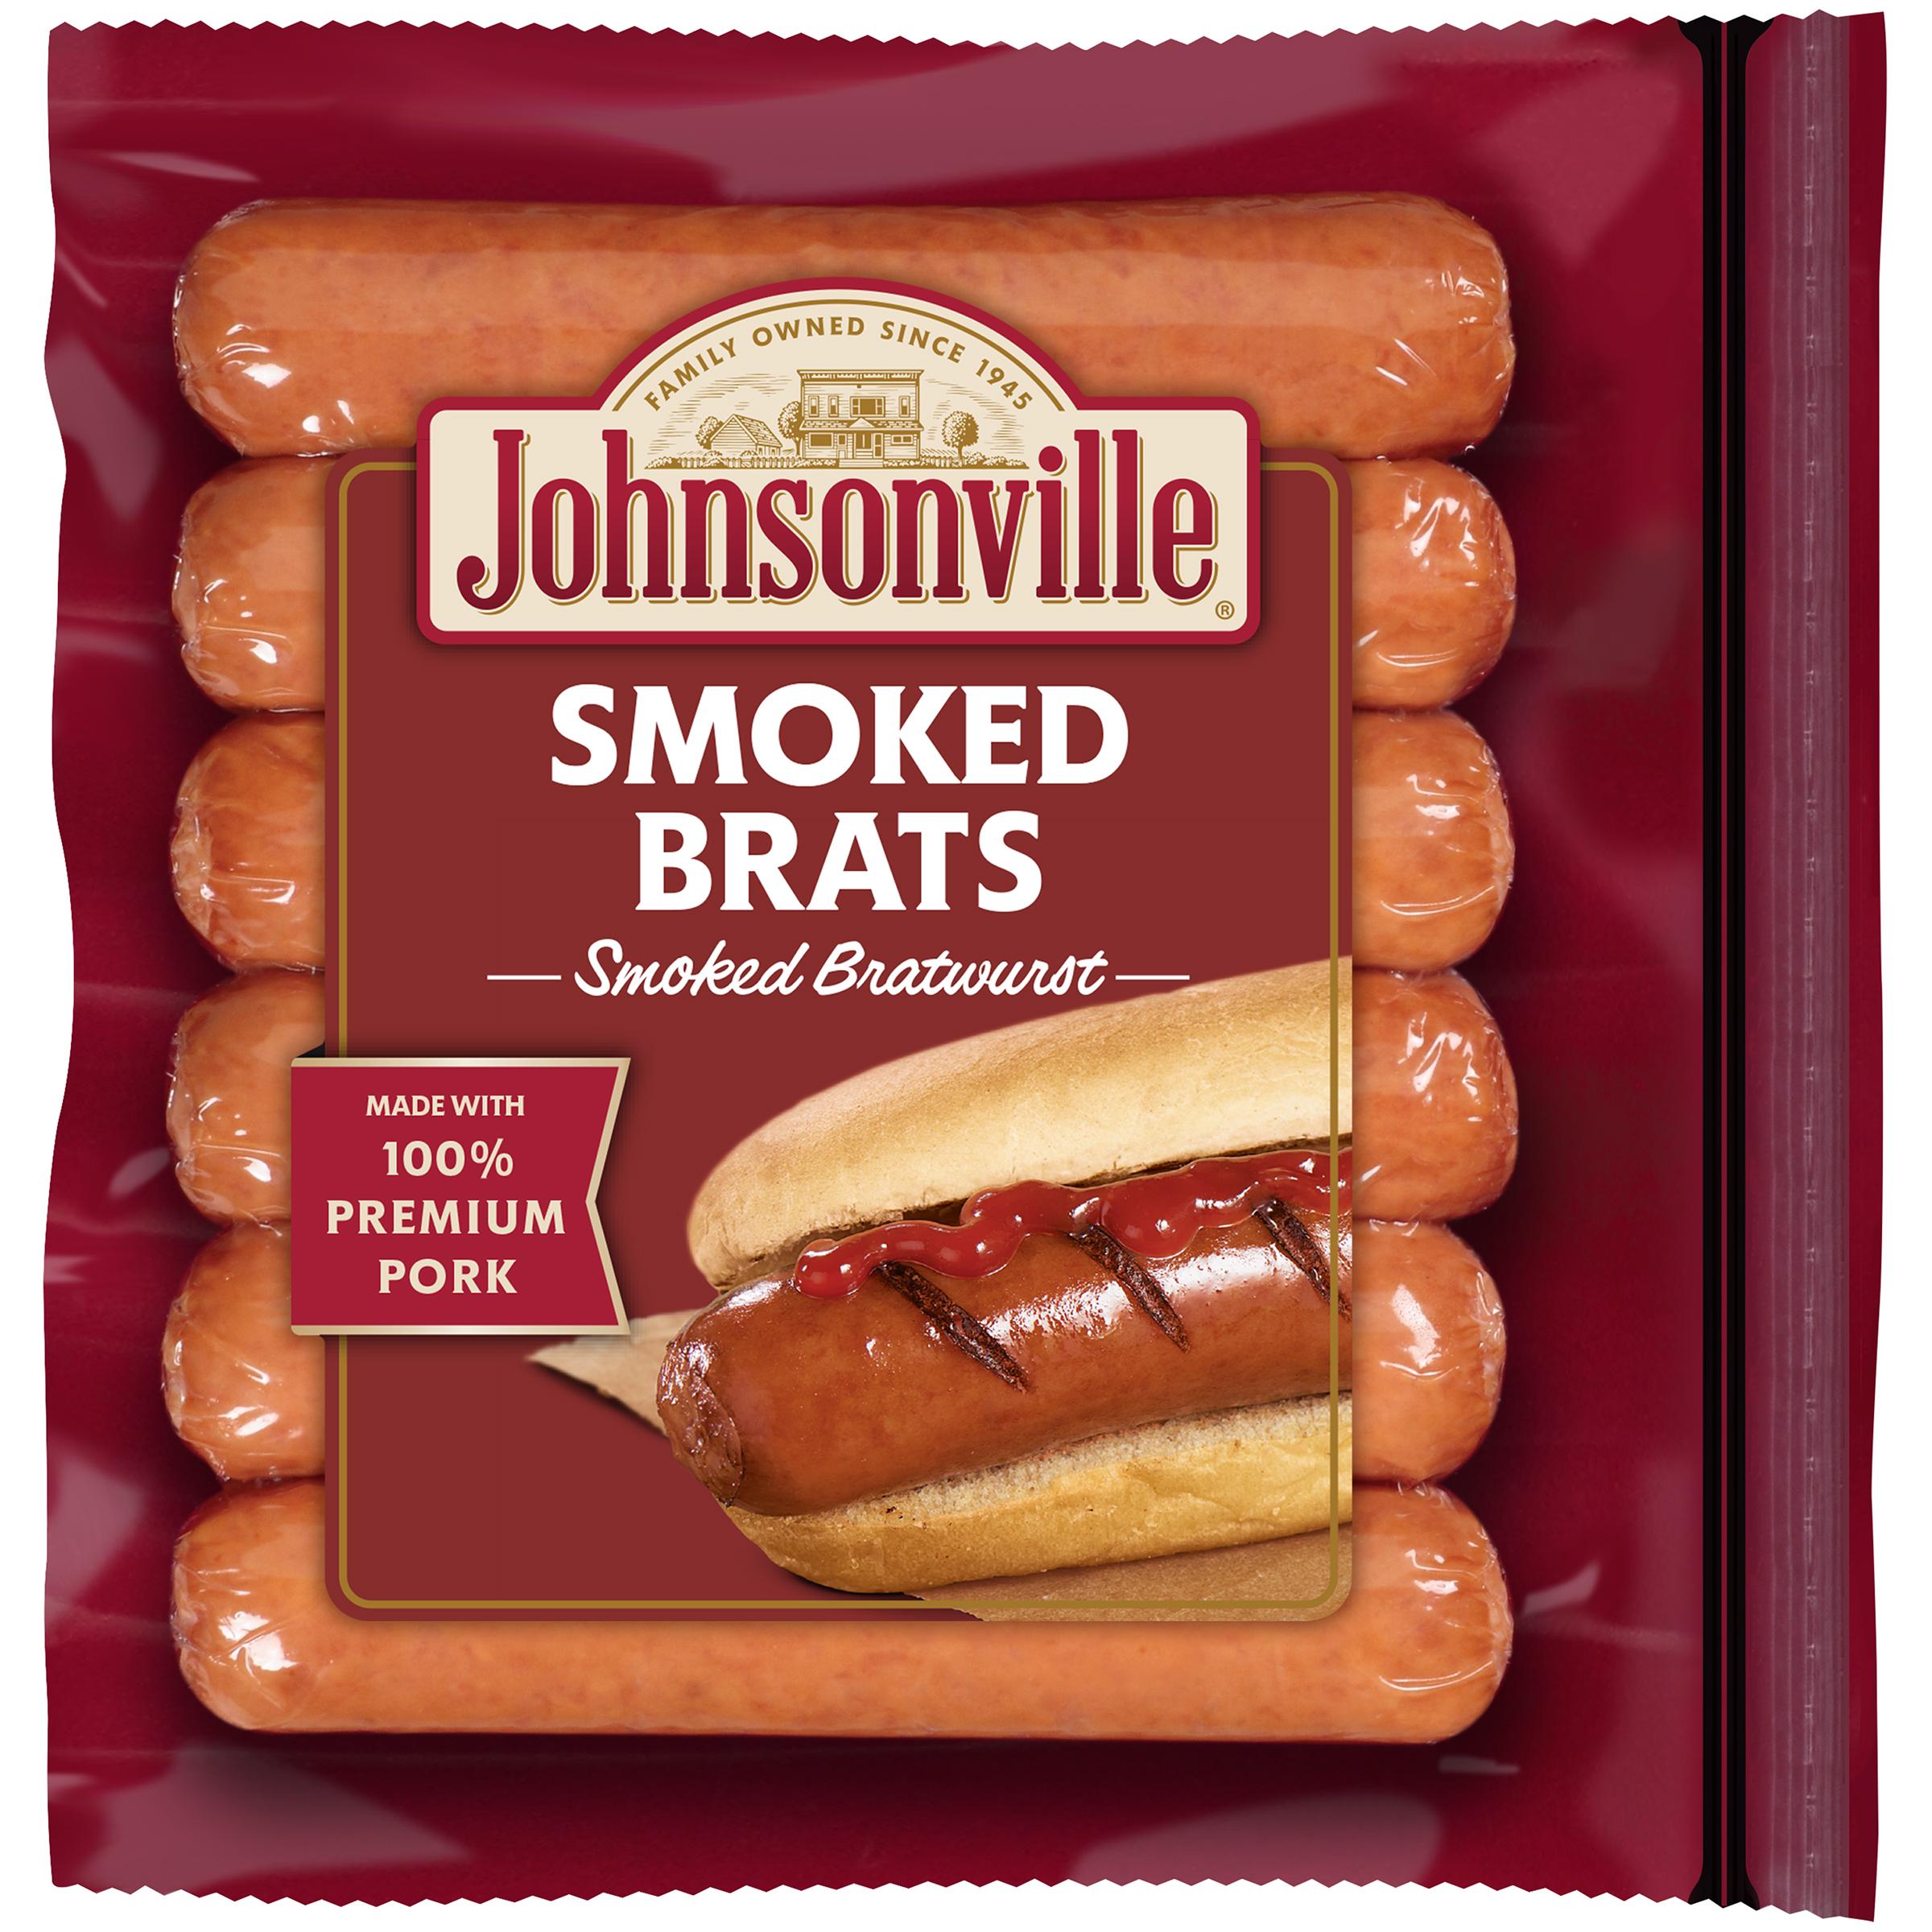 Johnsonville Smoked Brats 14oz zip pkg (100867) Holiday Promo